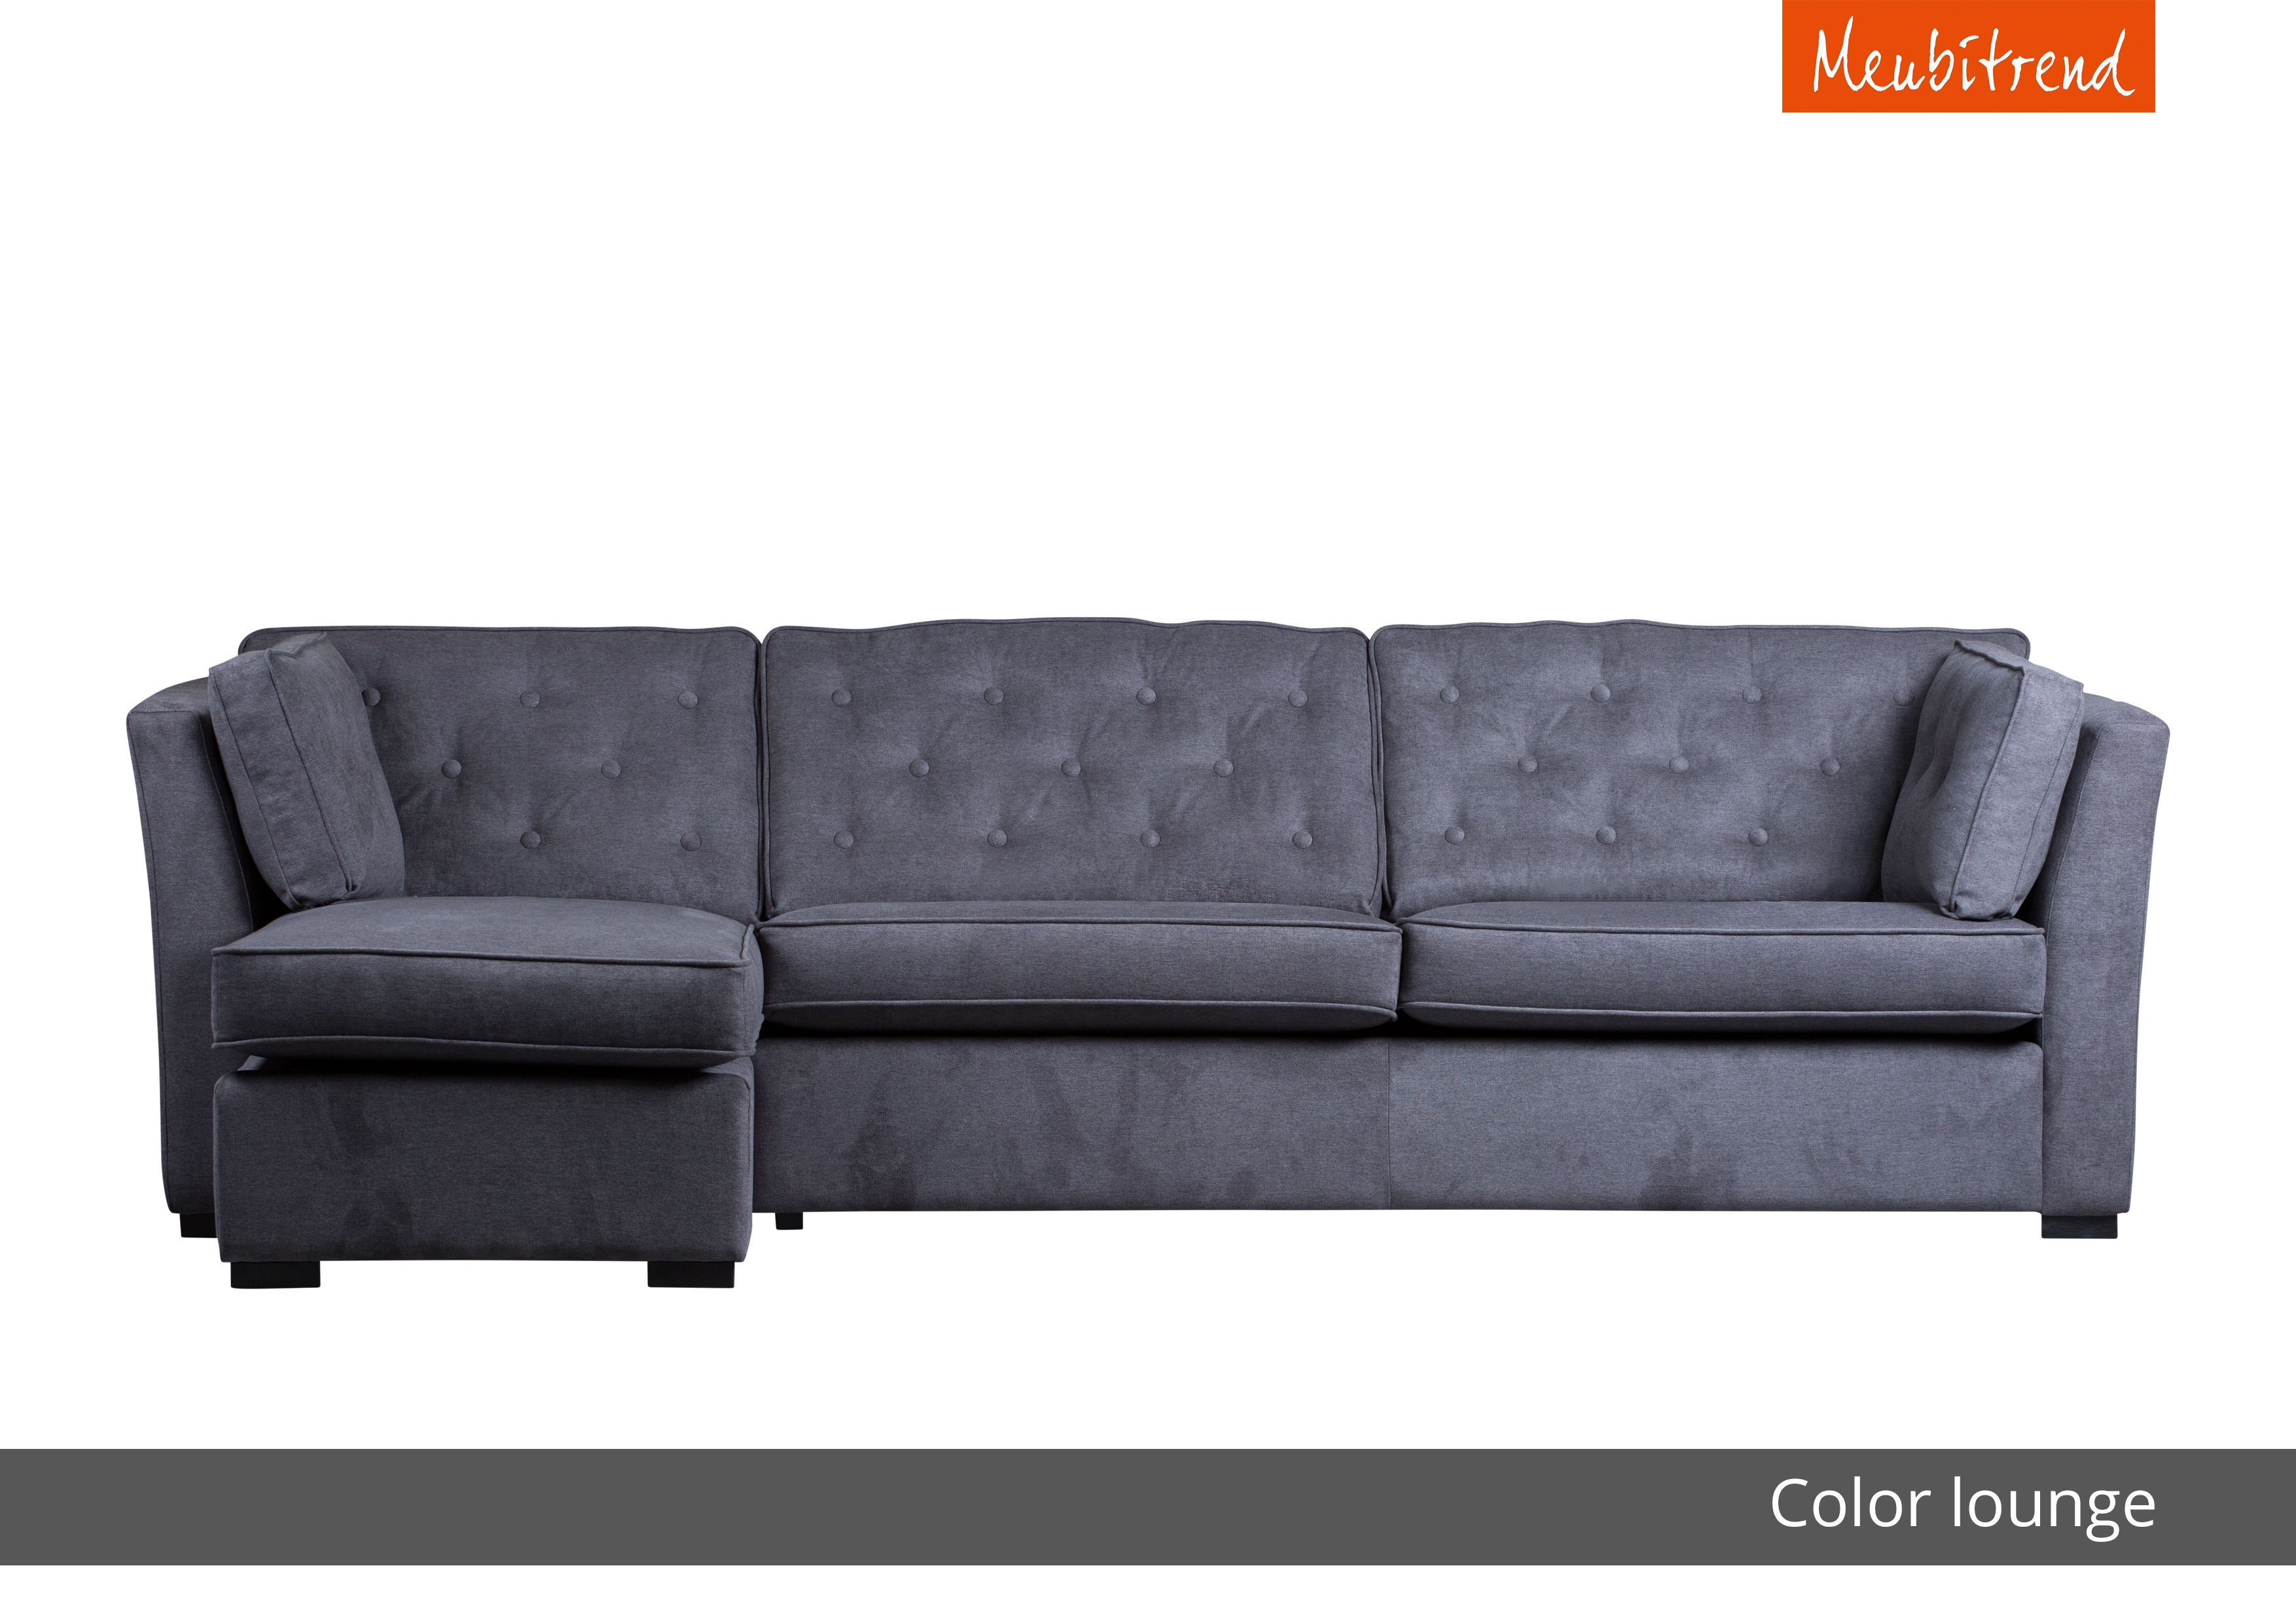 Lounge Hoekbank Antraciet.Meubitrend Bank Antraciet Color Lounge Knopen